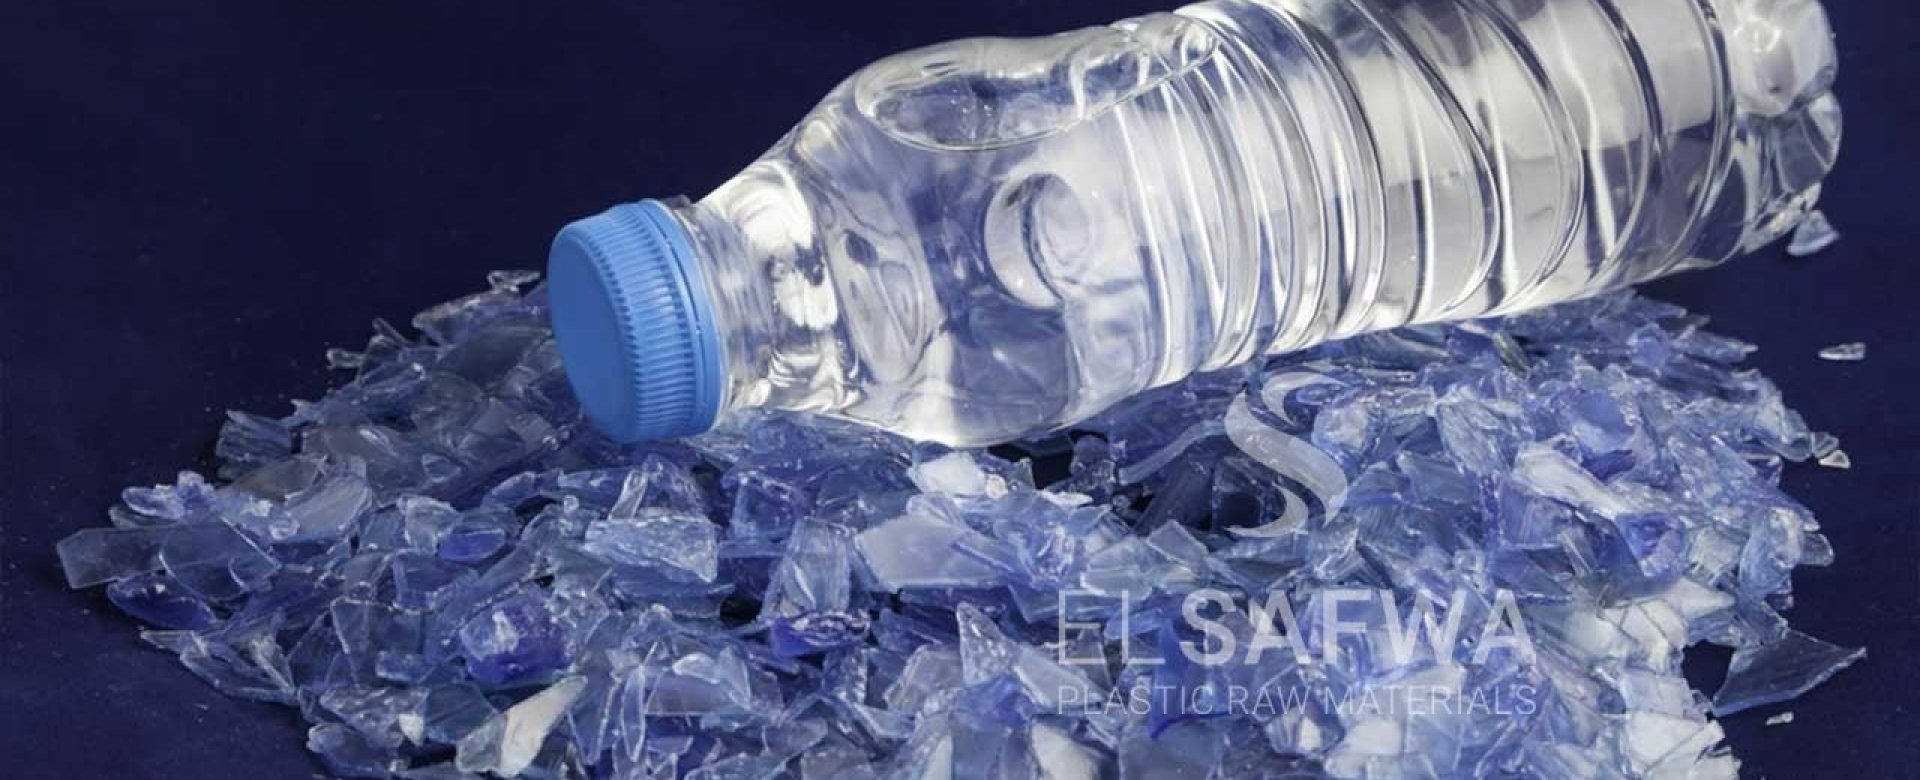 El-safwa-trade-plastic-trading-raw-materials-recycled-pet2